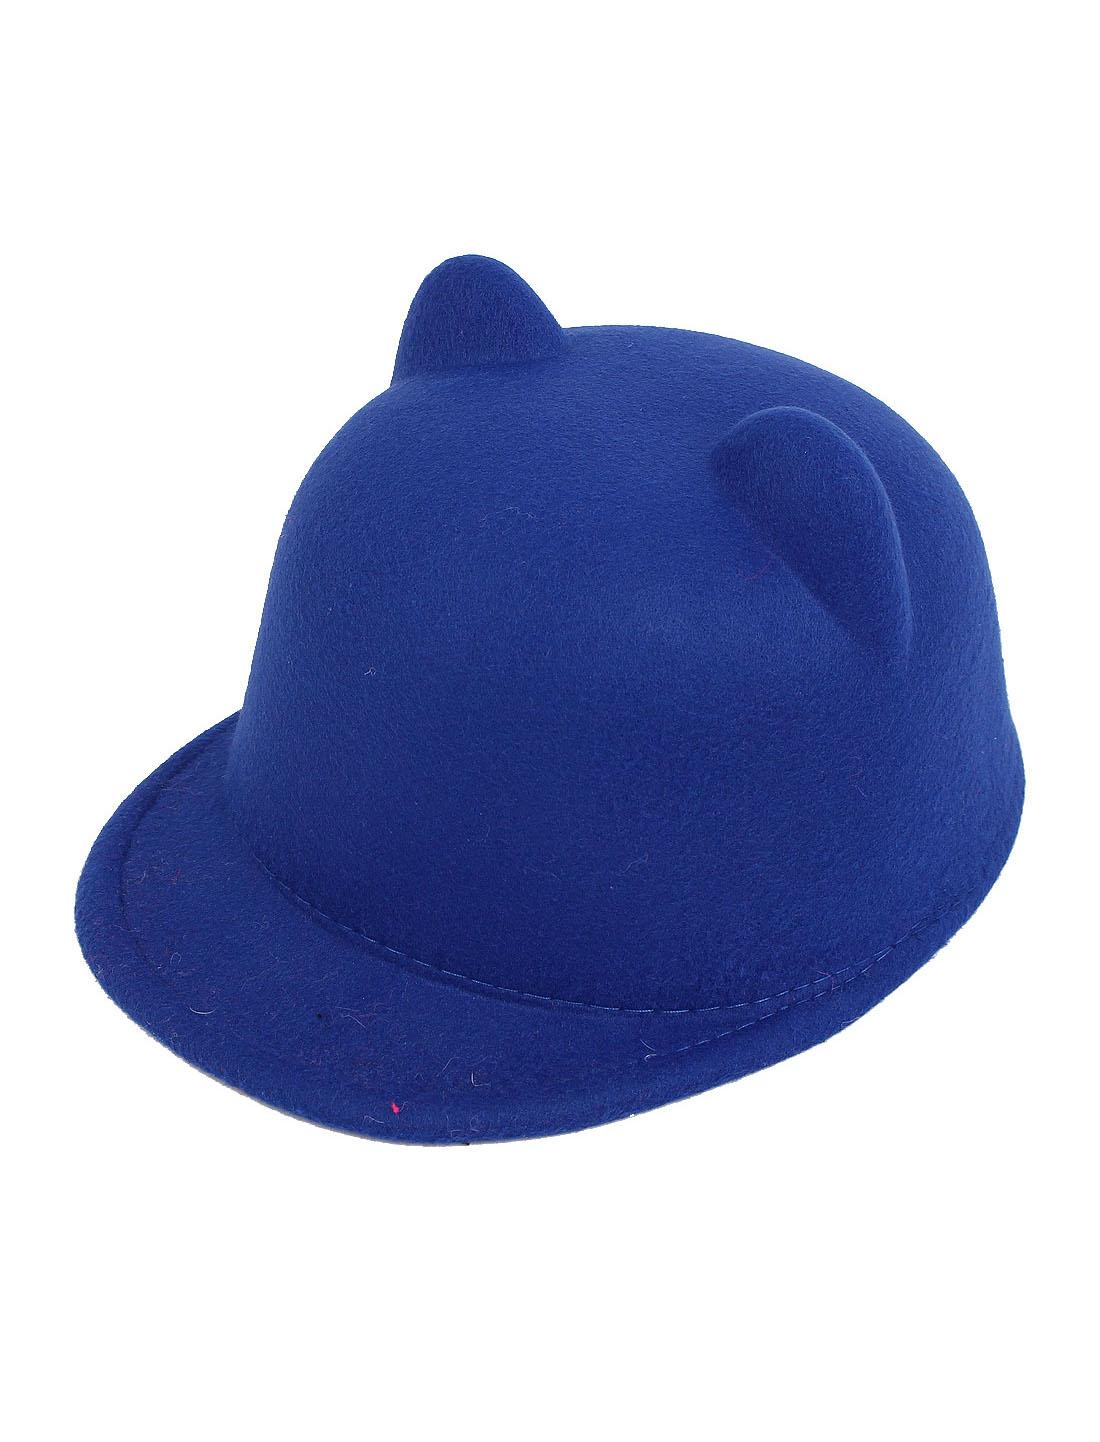 Girl Cat Ear Design Christmas Party Winter Warm Bowler Cap Hat Casquette Royal Blue